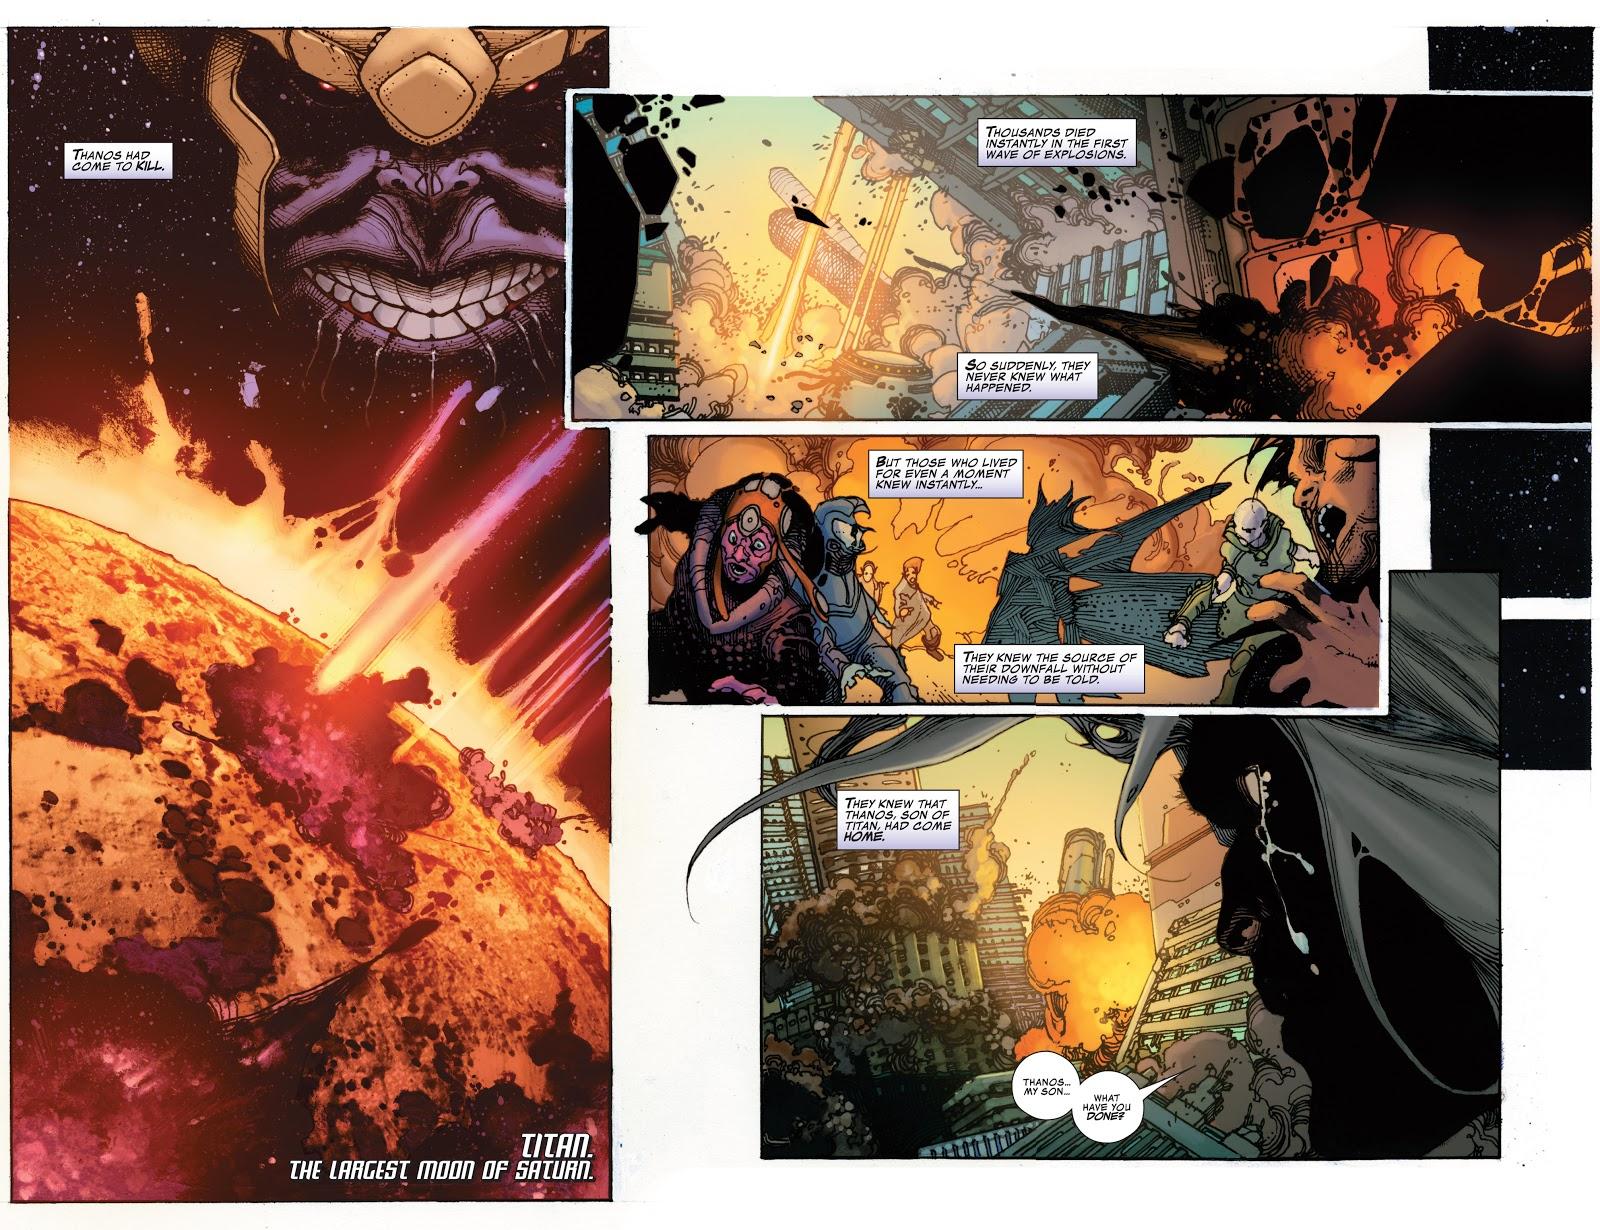 Thanos destroys Titan